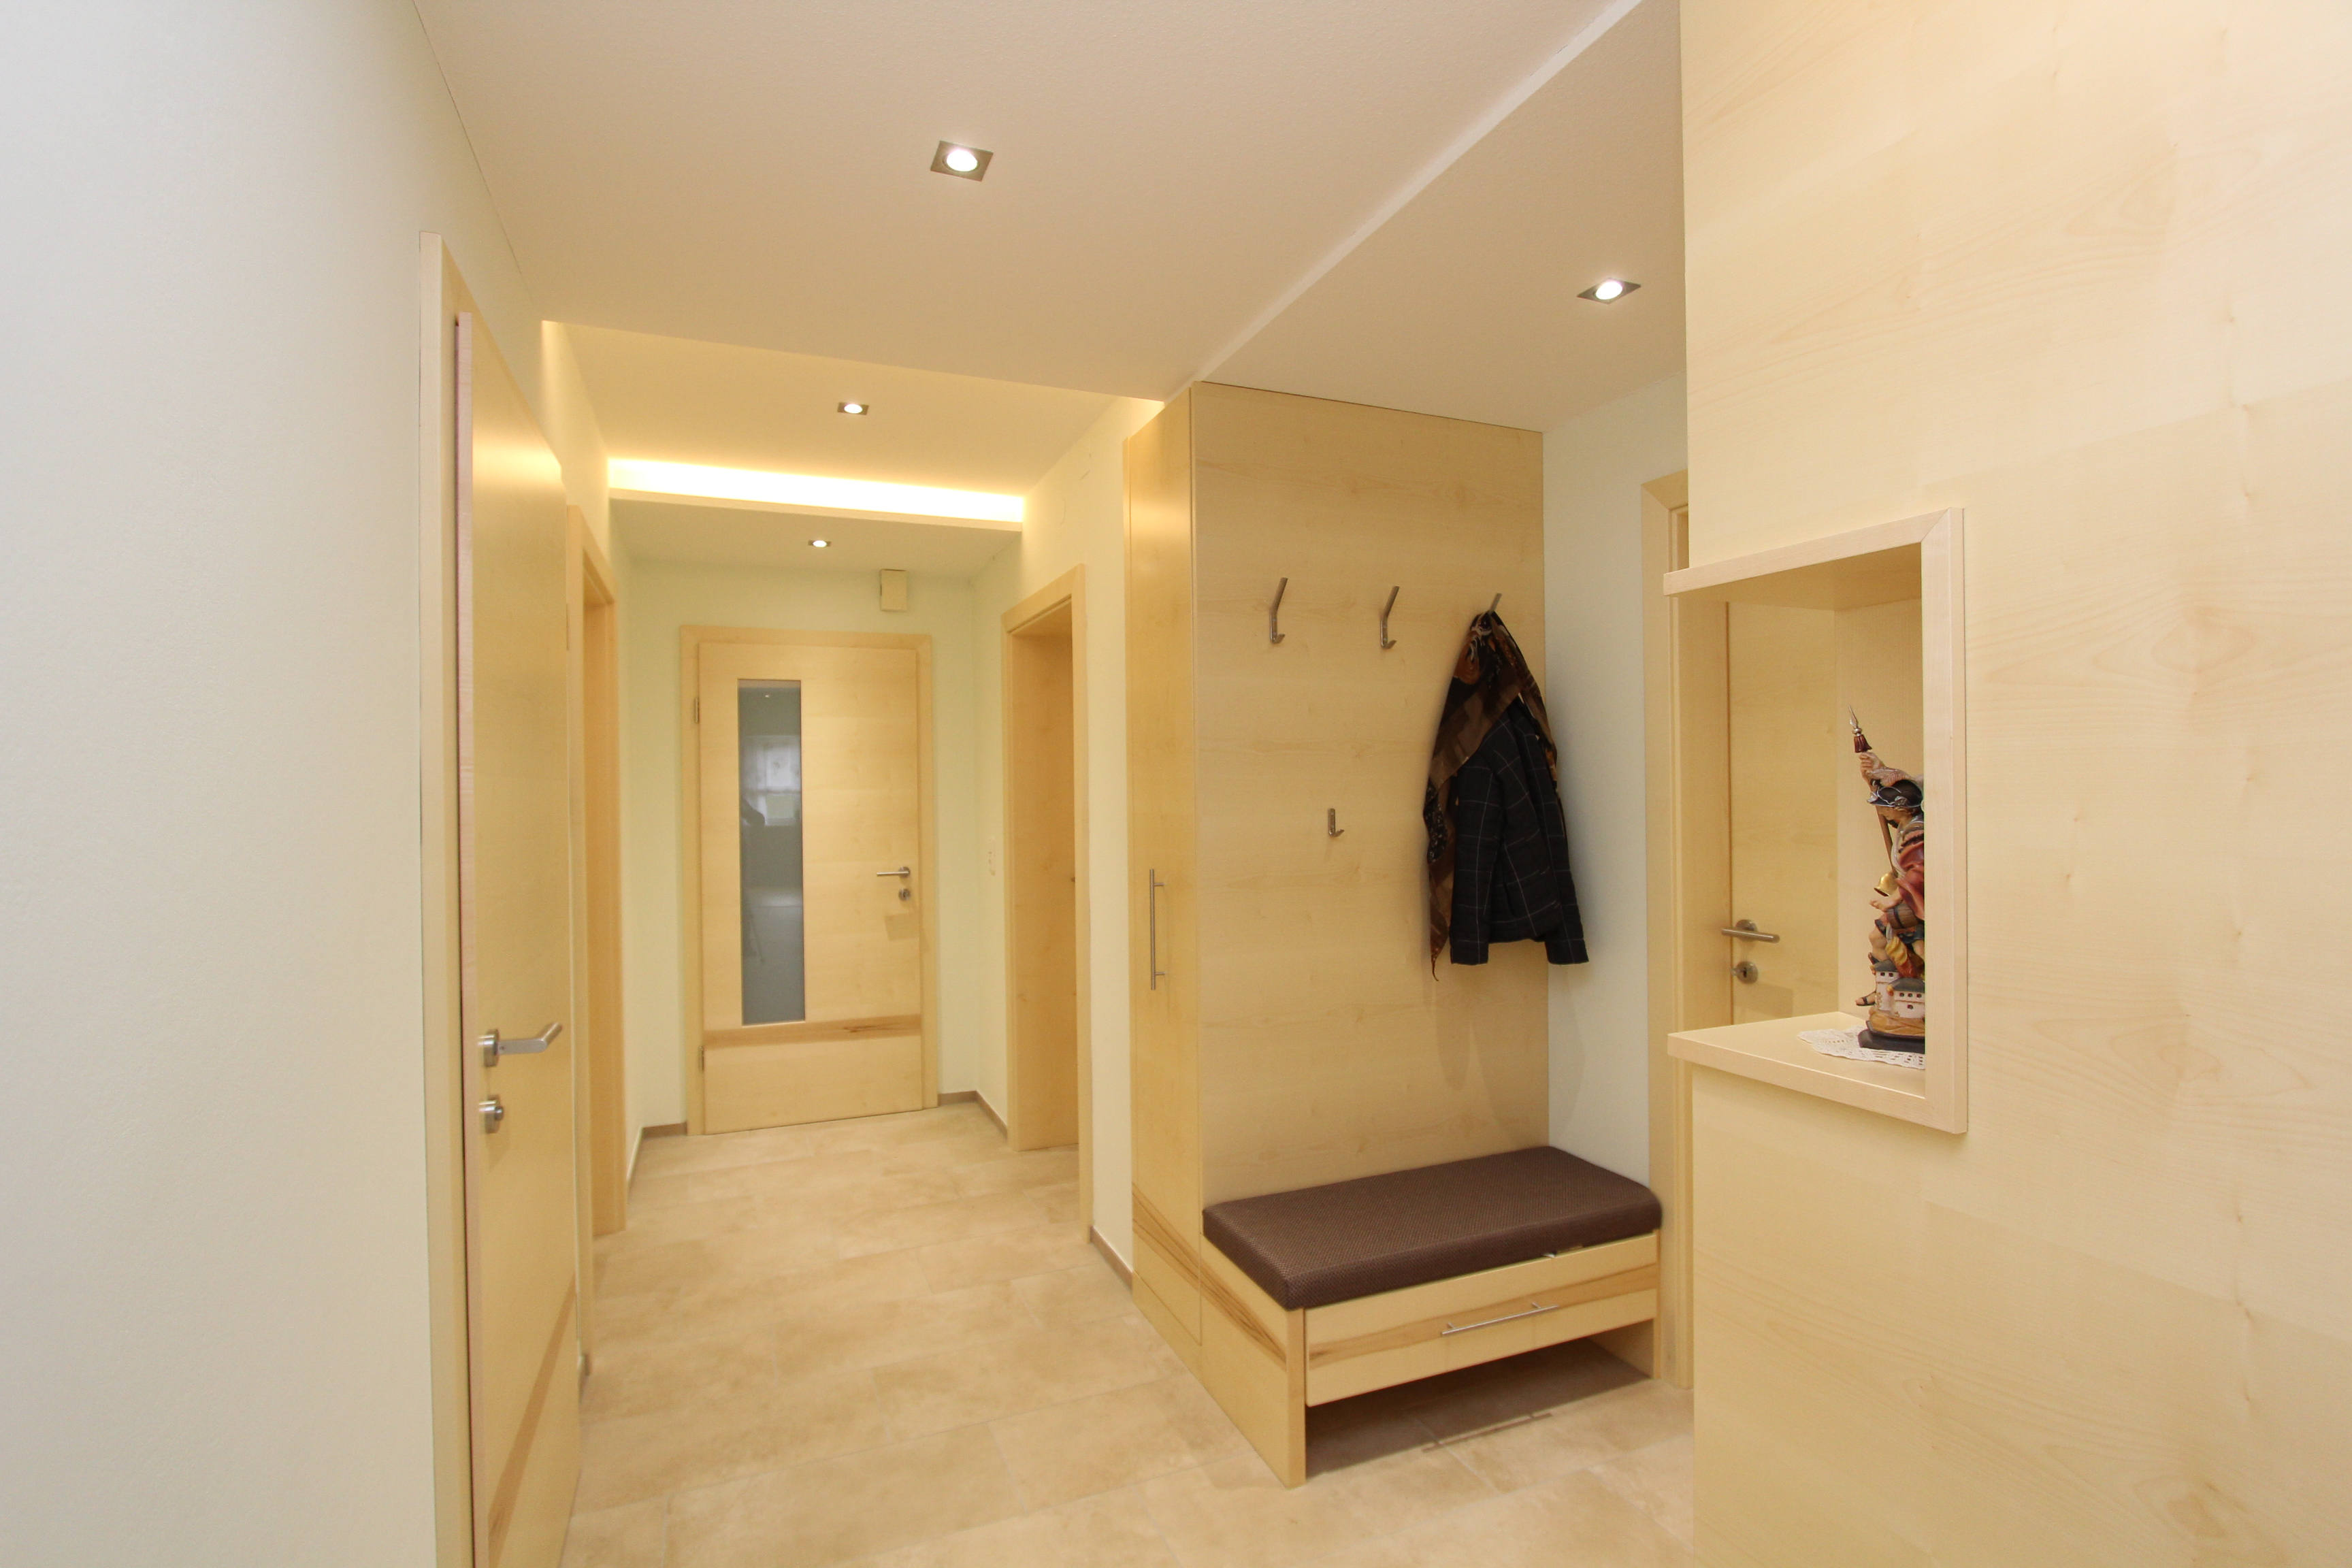 moderner vorraum in ahorn listberger tischlerei. Black Bedroom Furniture Sets. Home Design Ideas